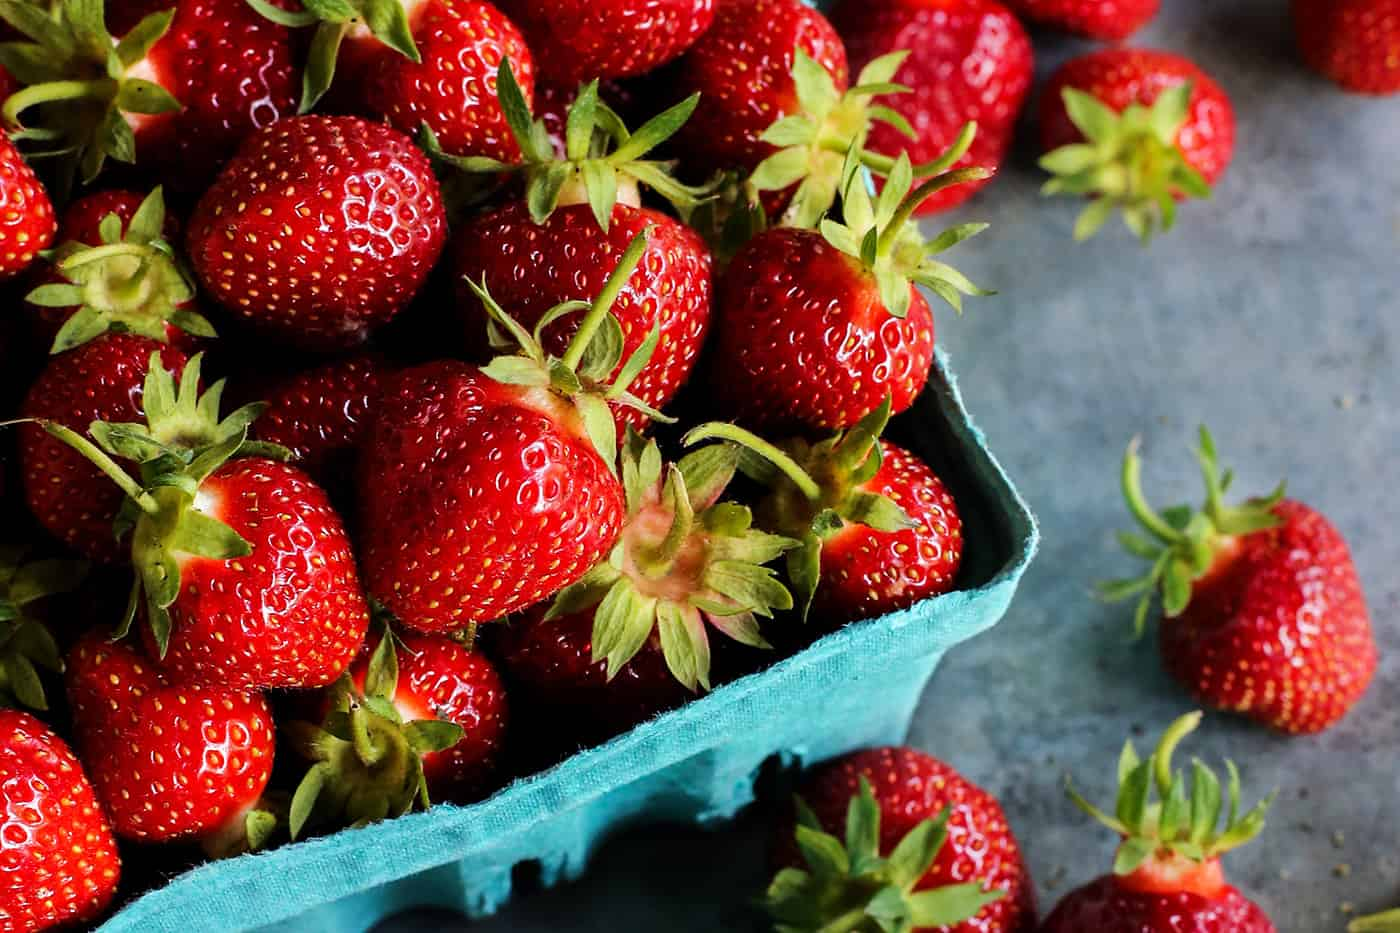 A basket of freshly picked strawberries